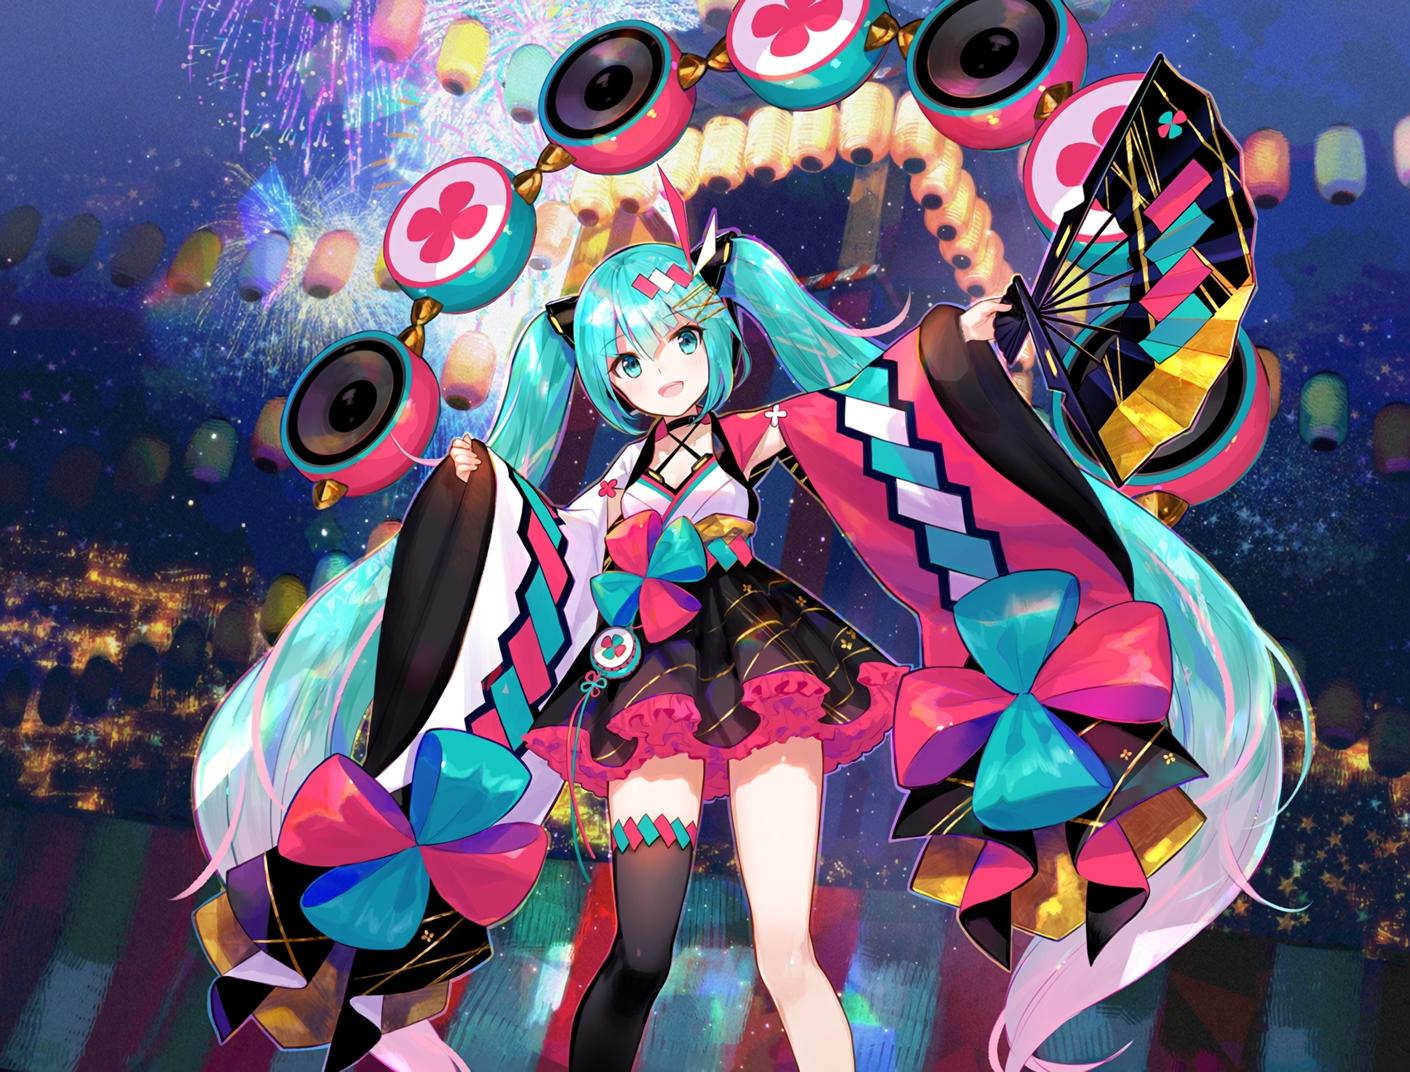 aqua_eyes aqua_hair choker cropped drums fan festival fireworks fuji_choko hatsune_miku instrument japanese_clothes long_hair magical_mirai_(vocaloid) skirt thighhighs twintails vocaloid waifu2x zettai_ryouiki